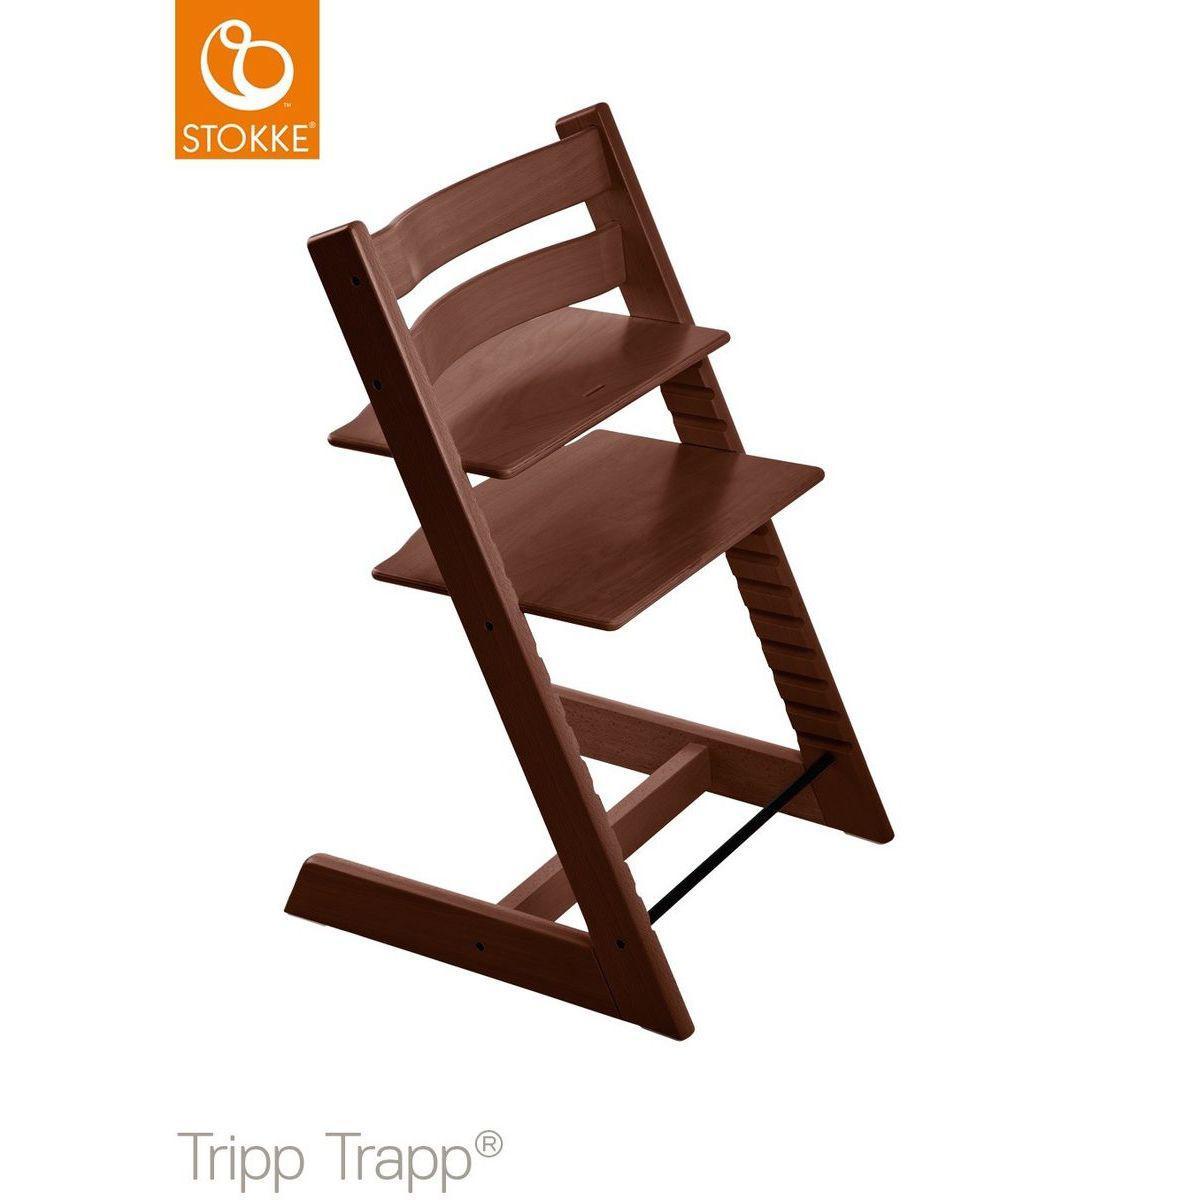 Chaise haute TRIPP TRAPP Stokke noyer